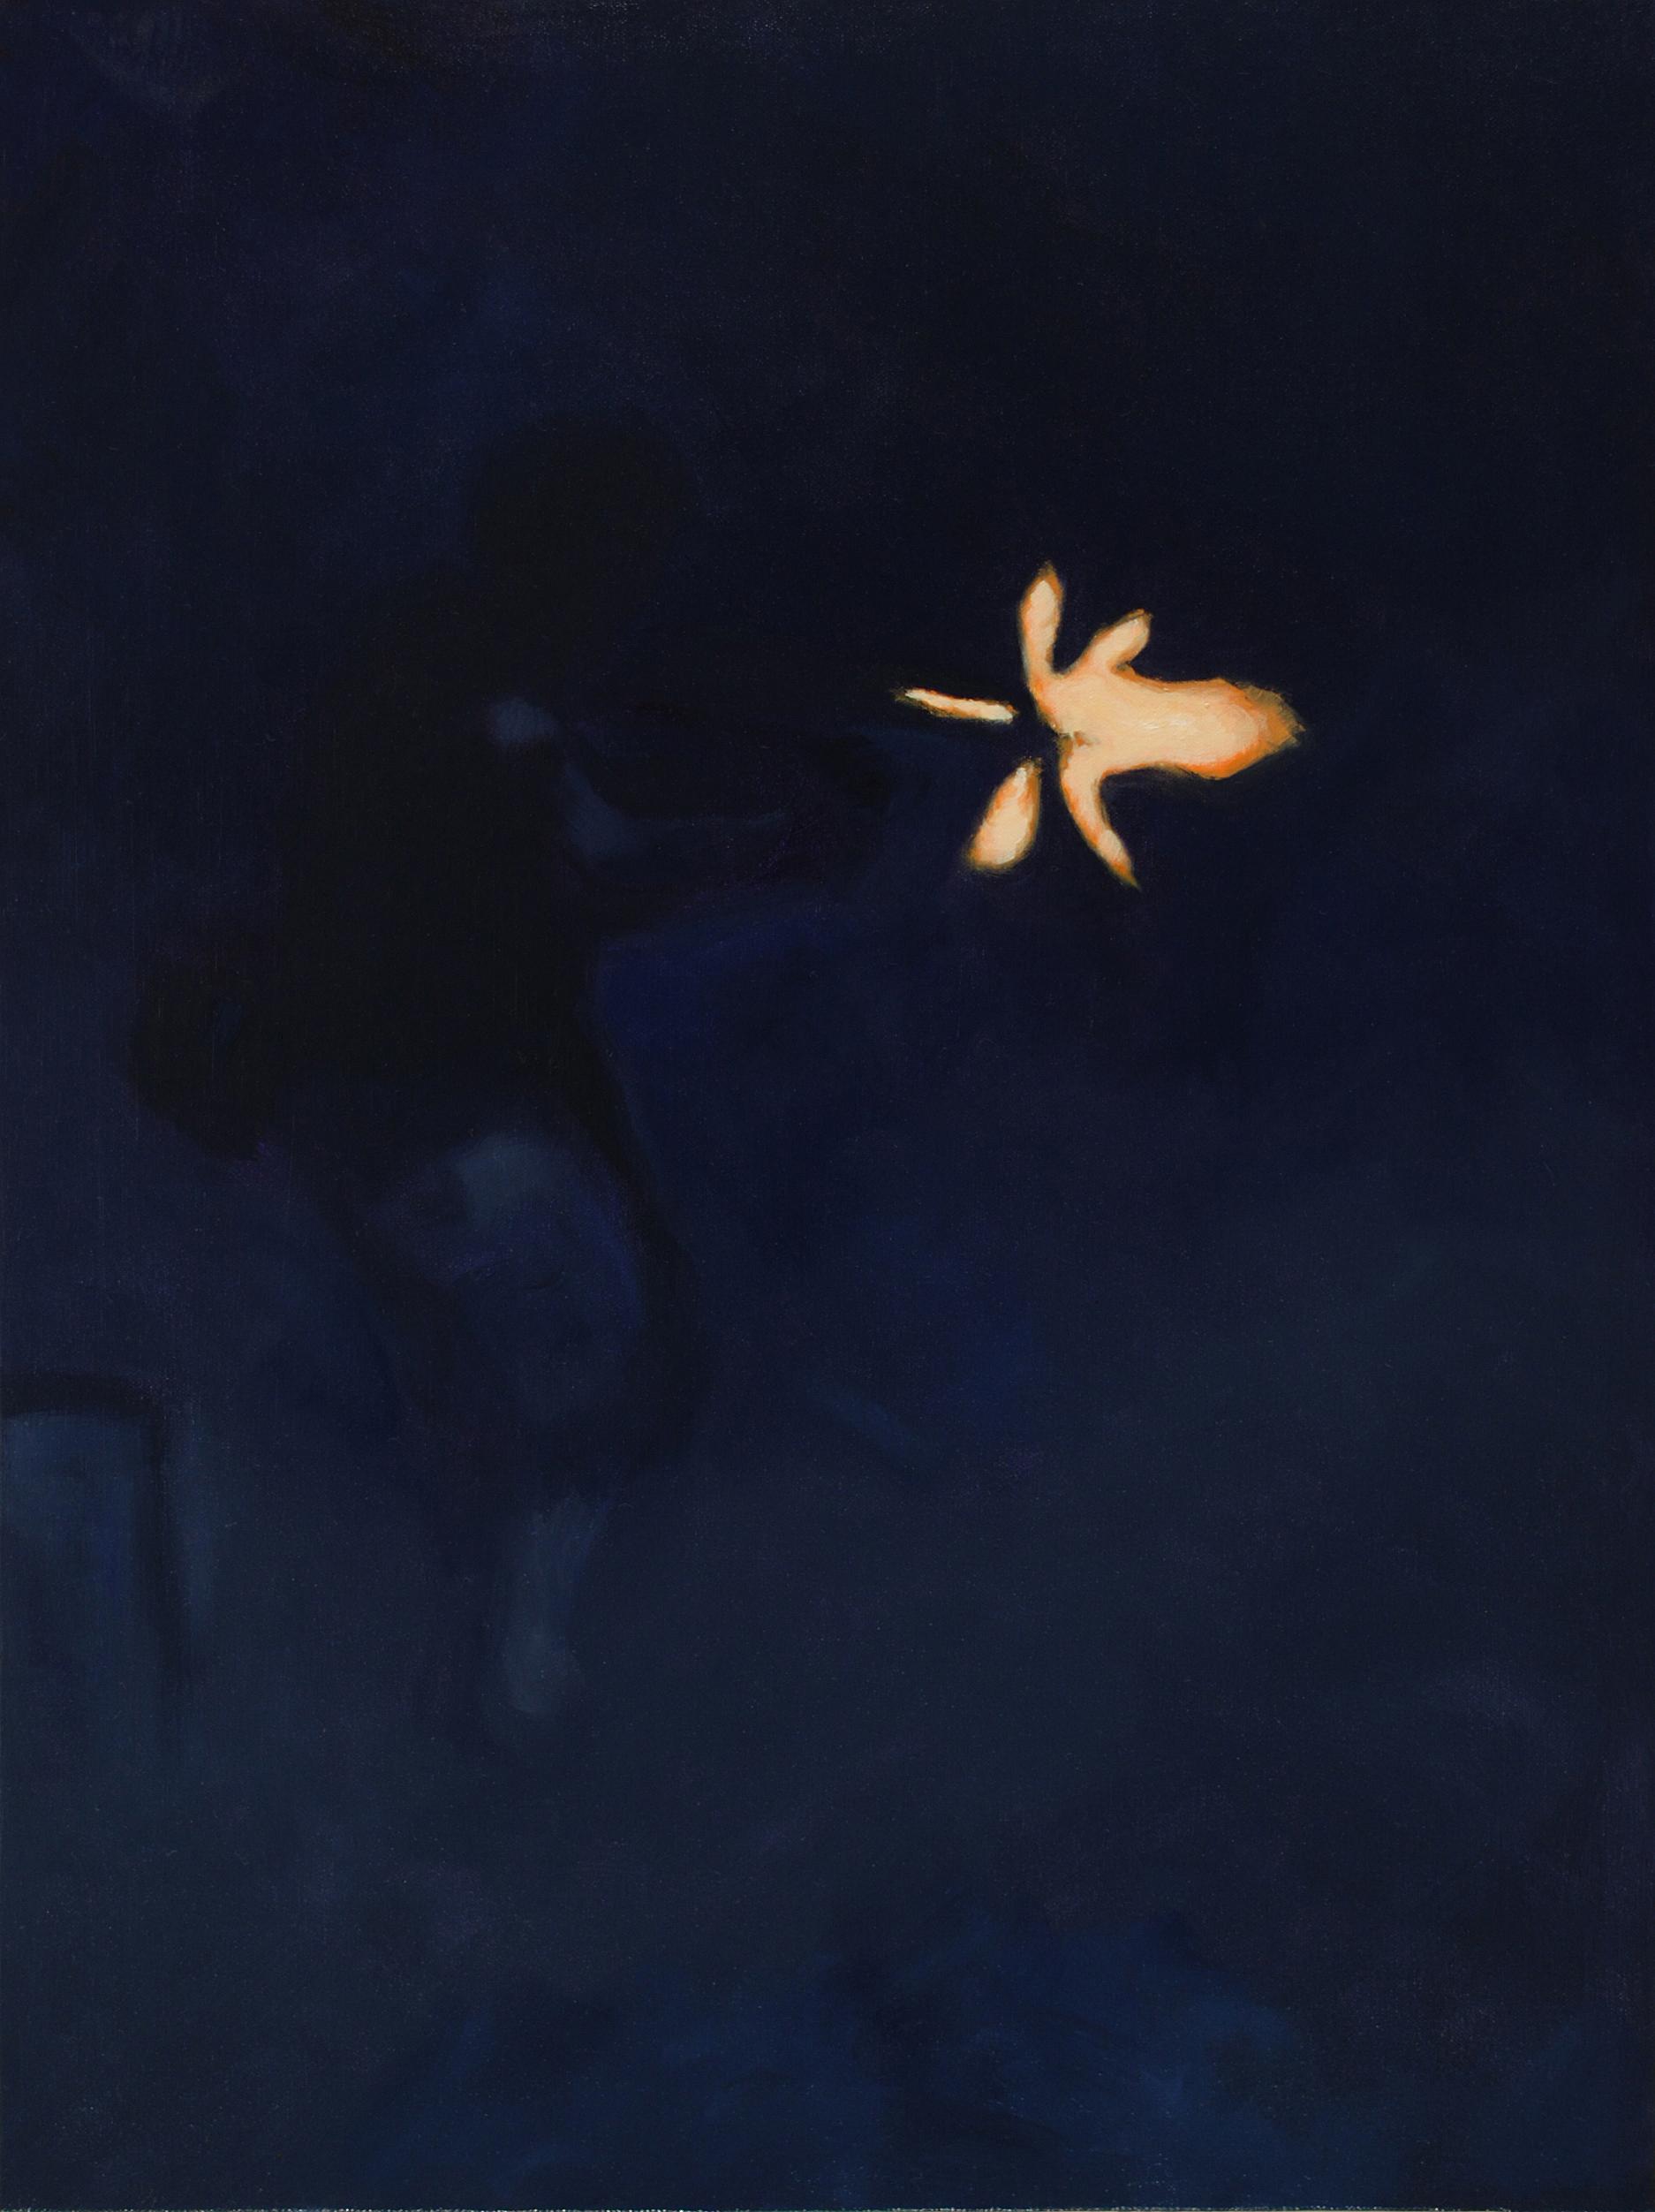 The Nighthawks (after Edward Hopper)